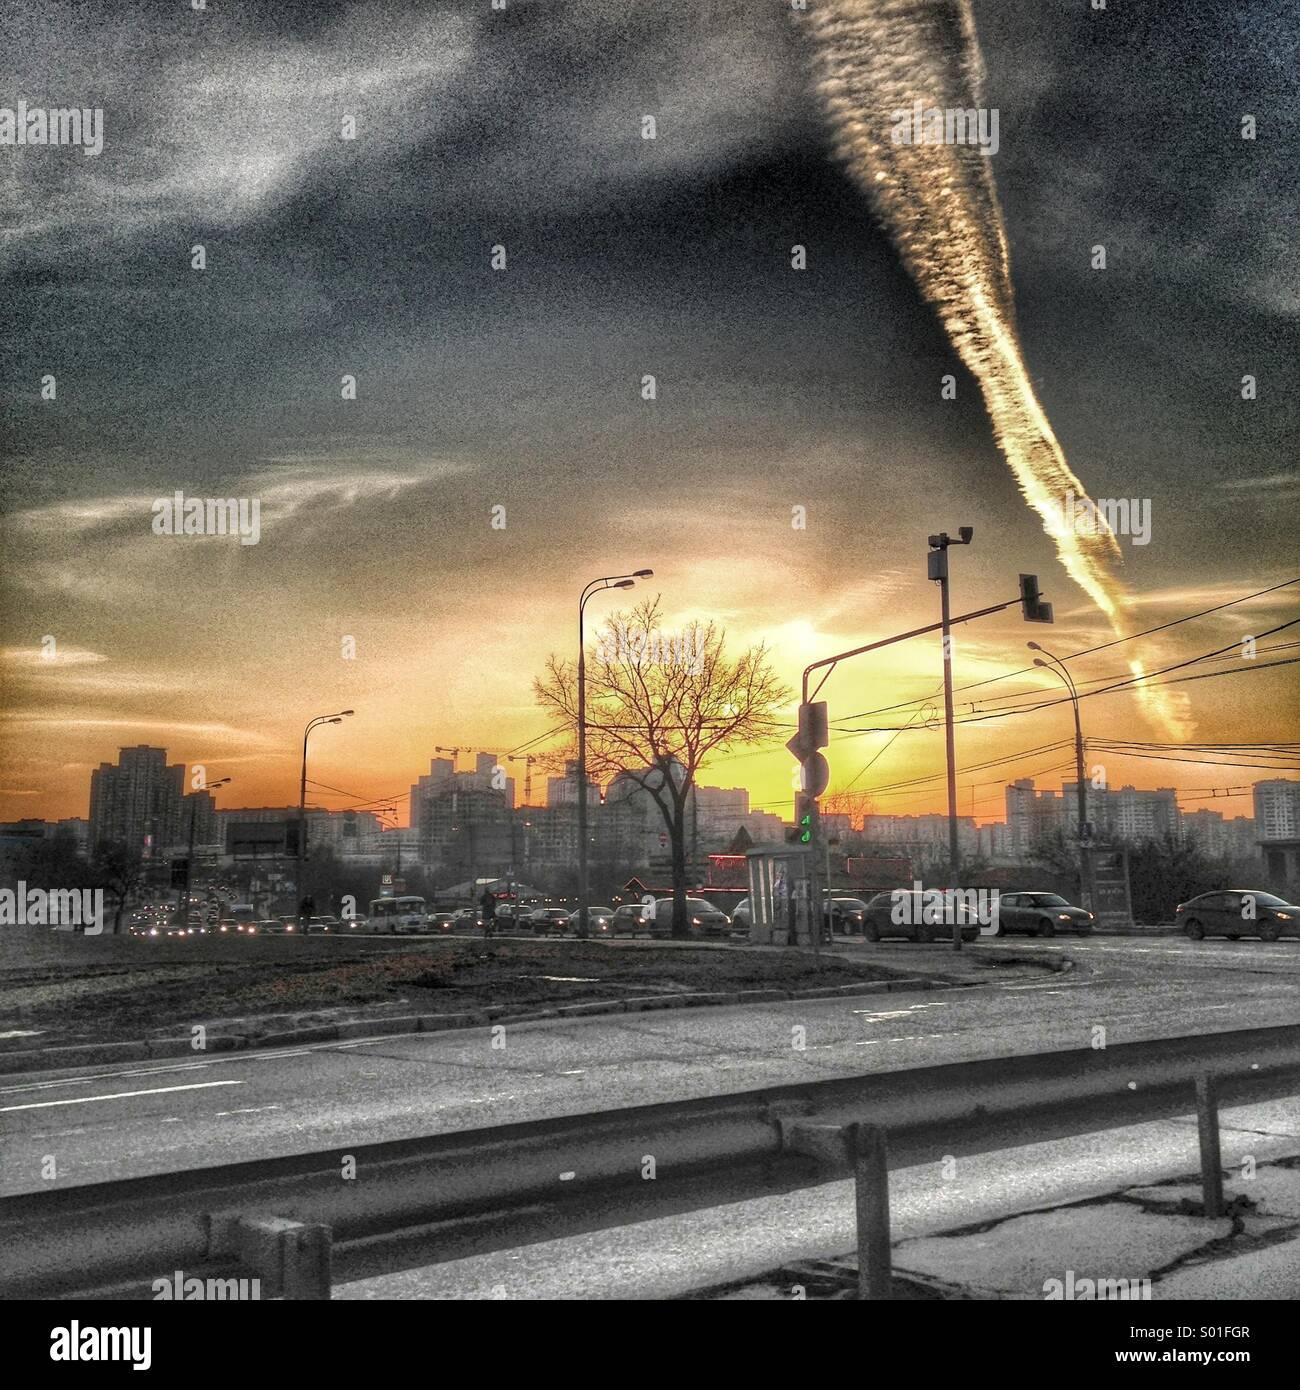 Post-apocalyptic urban landscape - Stock Image